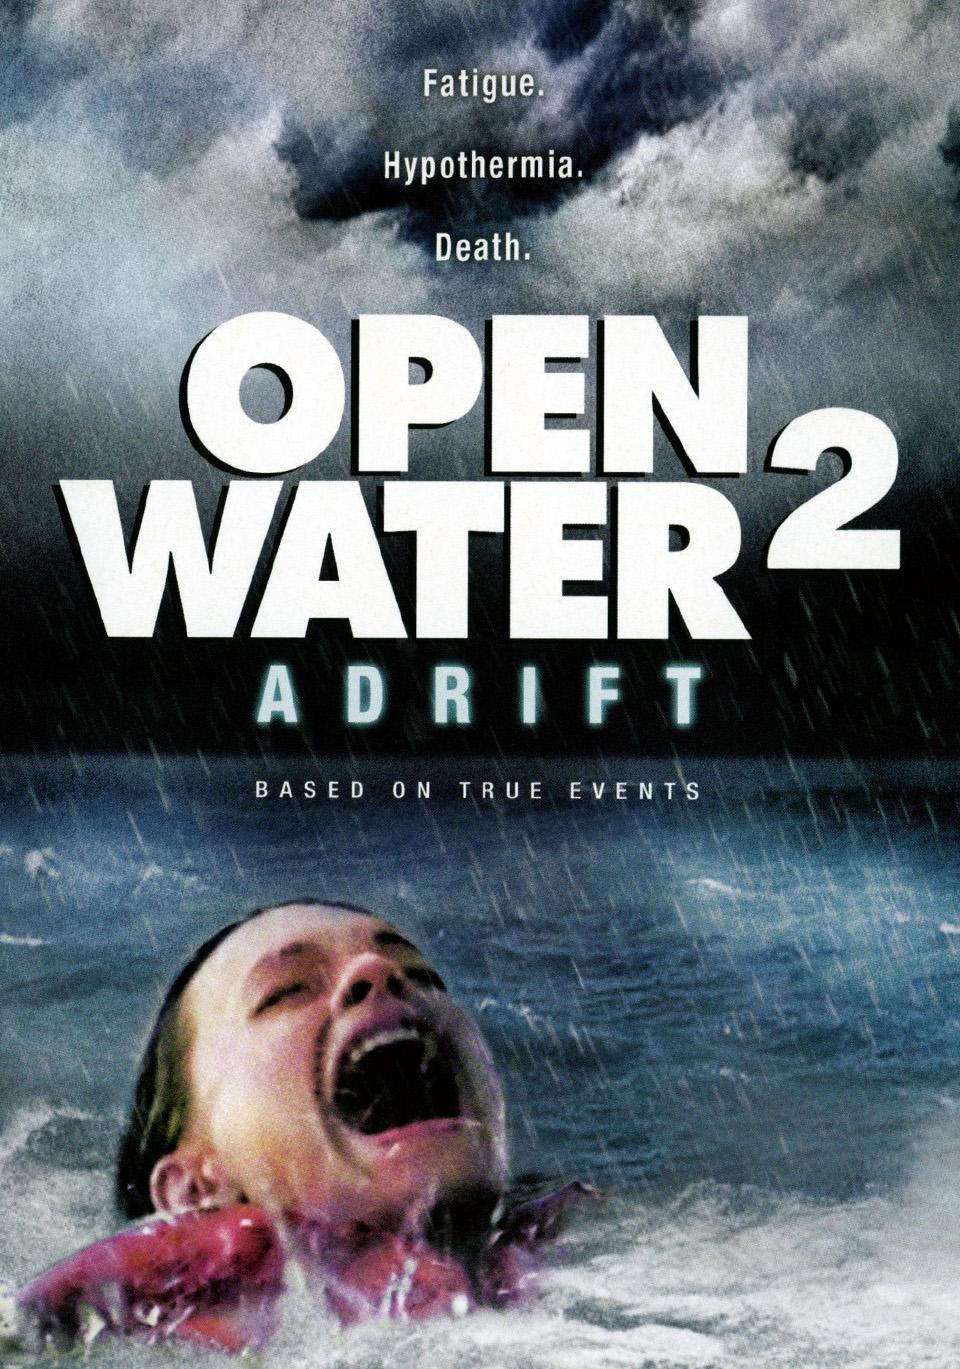 PALIKTI VANDENYNE 2: DREIFAS (2006) / OPEN WATER 2: ADRIFT